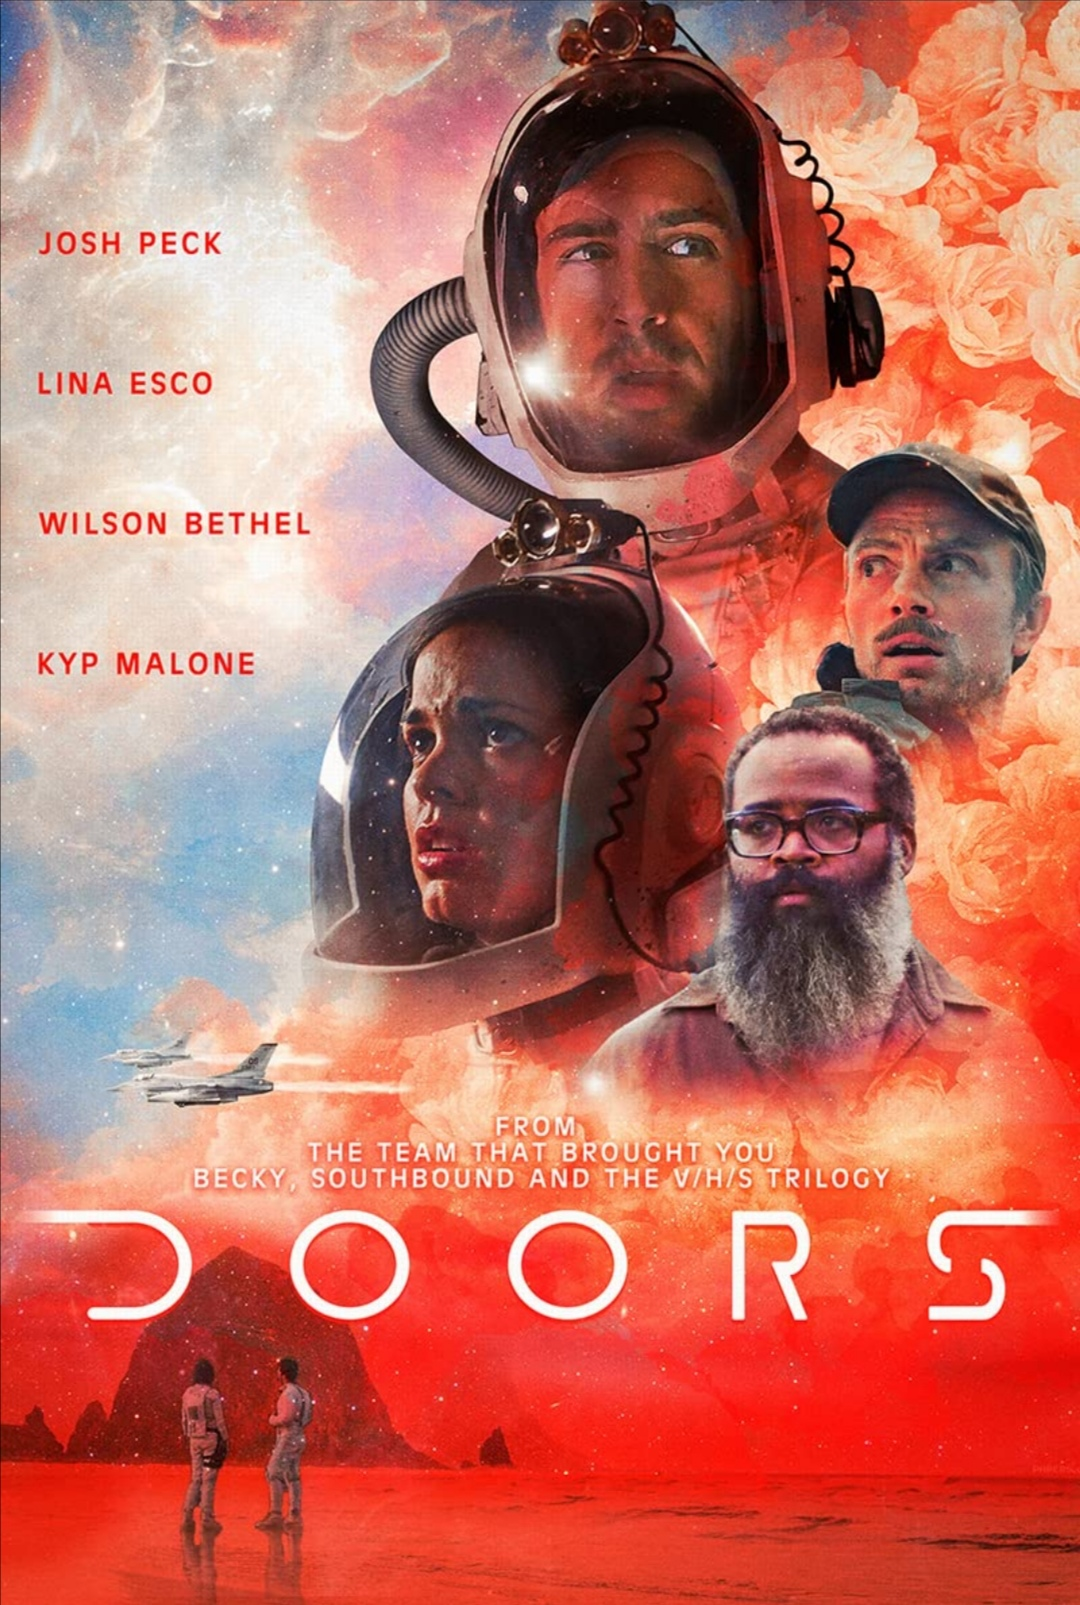 doors filme ficcao cientifica com josh peck - DOORS   Ficção científica cósmica com Josh Peck